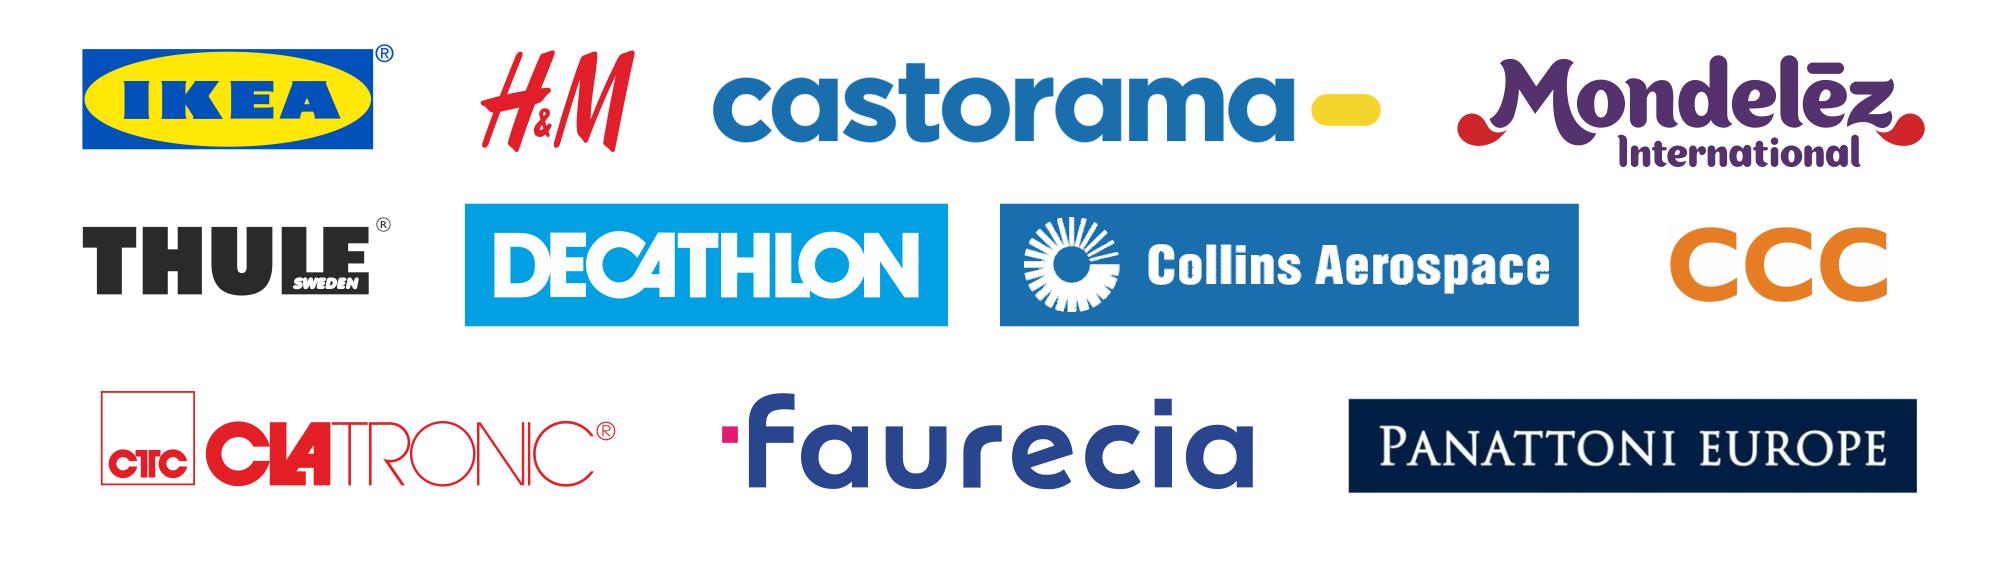 Logotypy Klientów: IKEA, H&M, Castorama, Mondelez, Thule, Decathlon, Collins Aerospace, CCC, Clatronic, Faurecia, Panattoni Europe